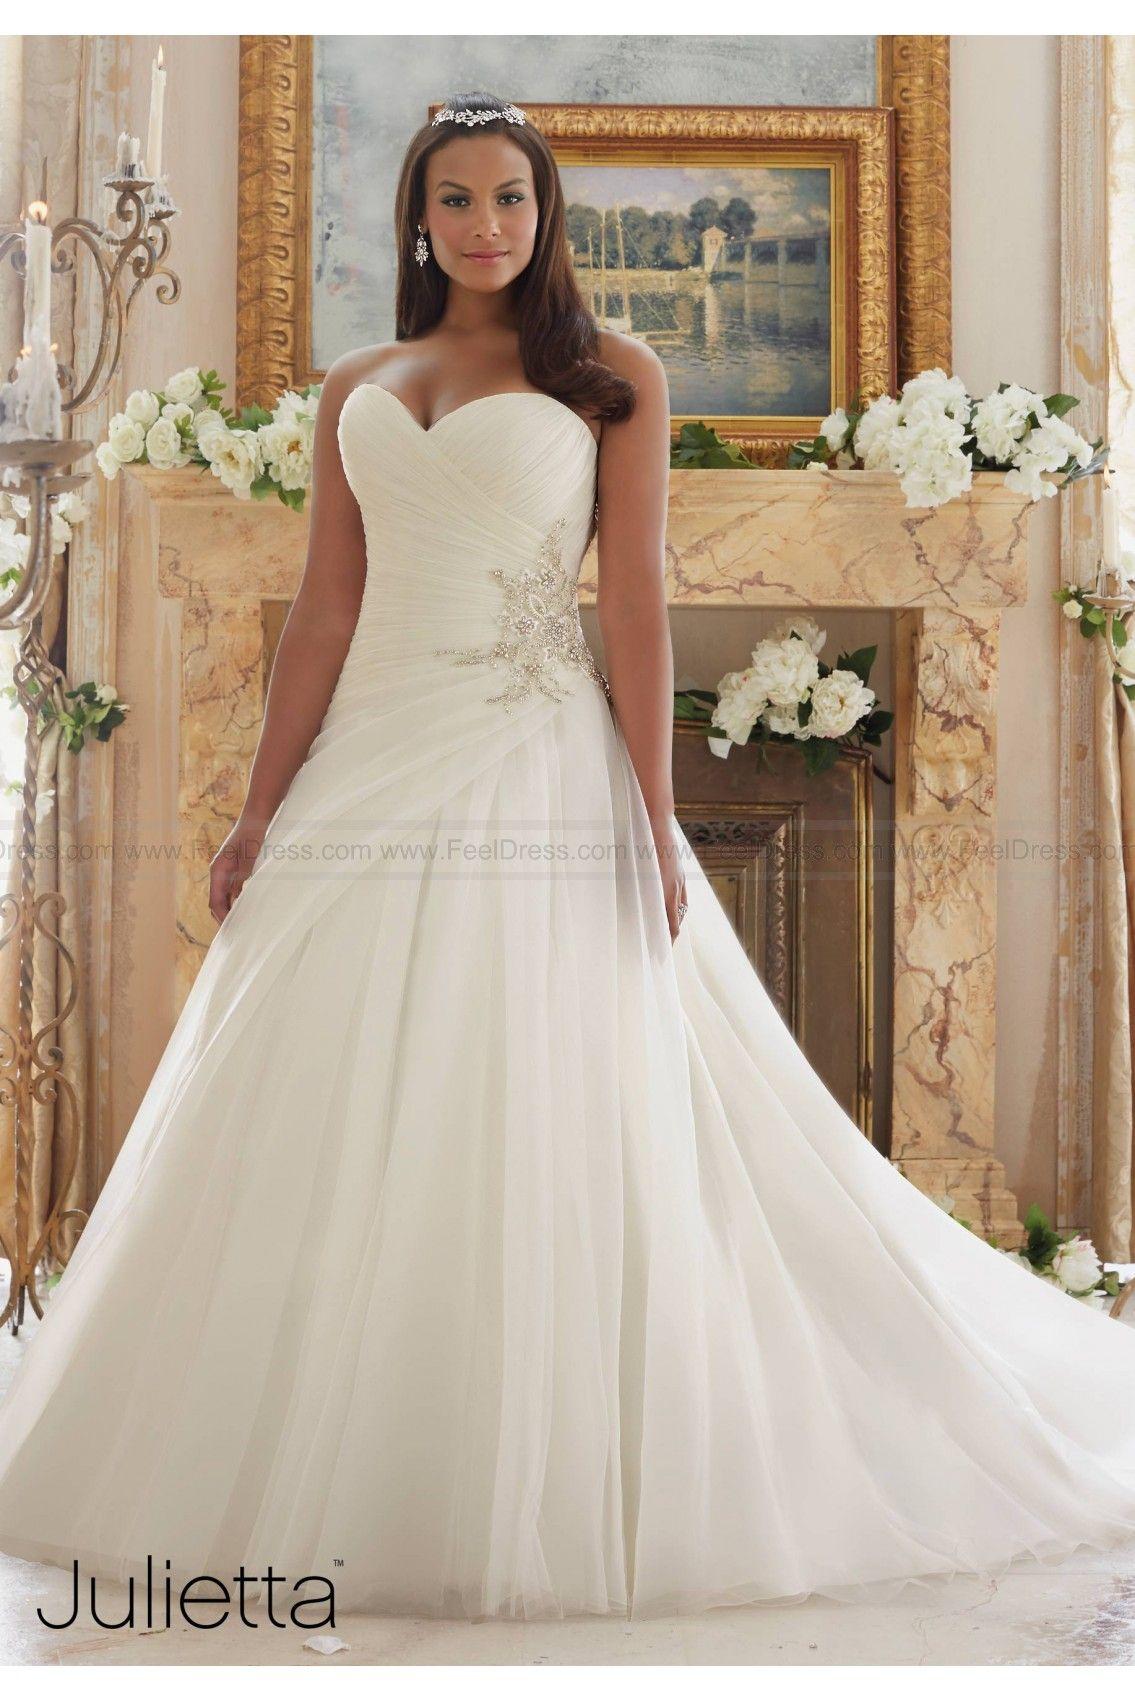 Mori lee wedding dresses style mori lee pinterest wedding